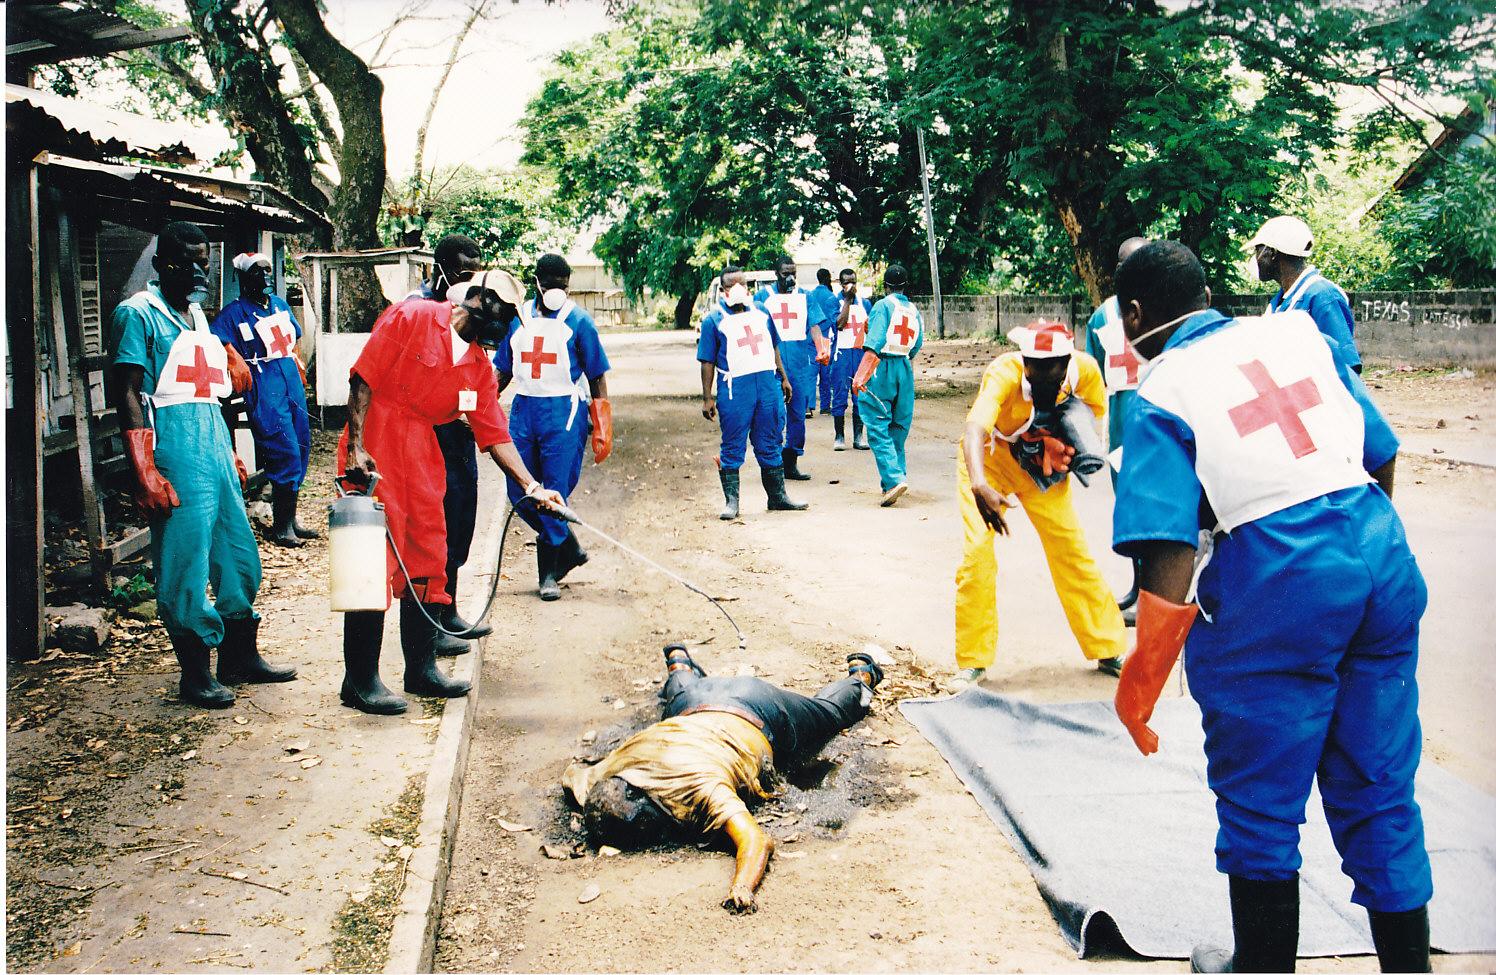 Congo_Brazaville_1997_0001